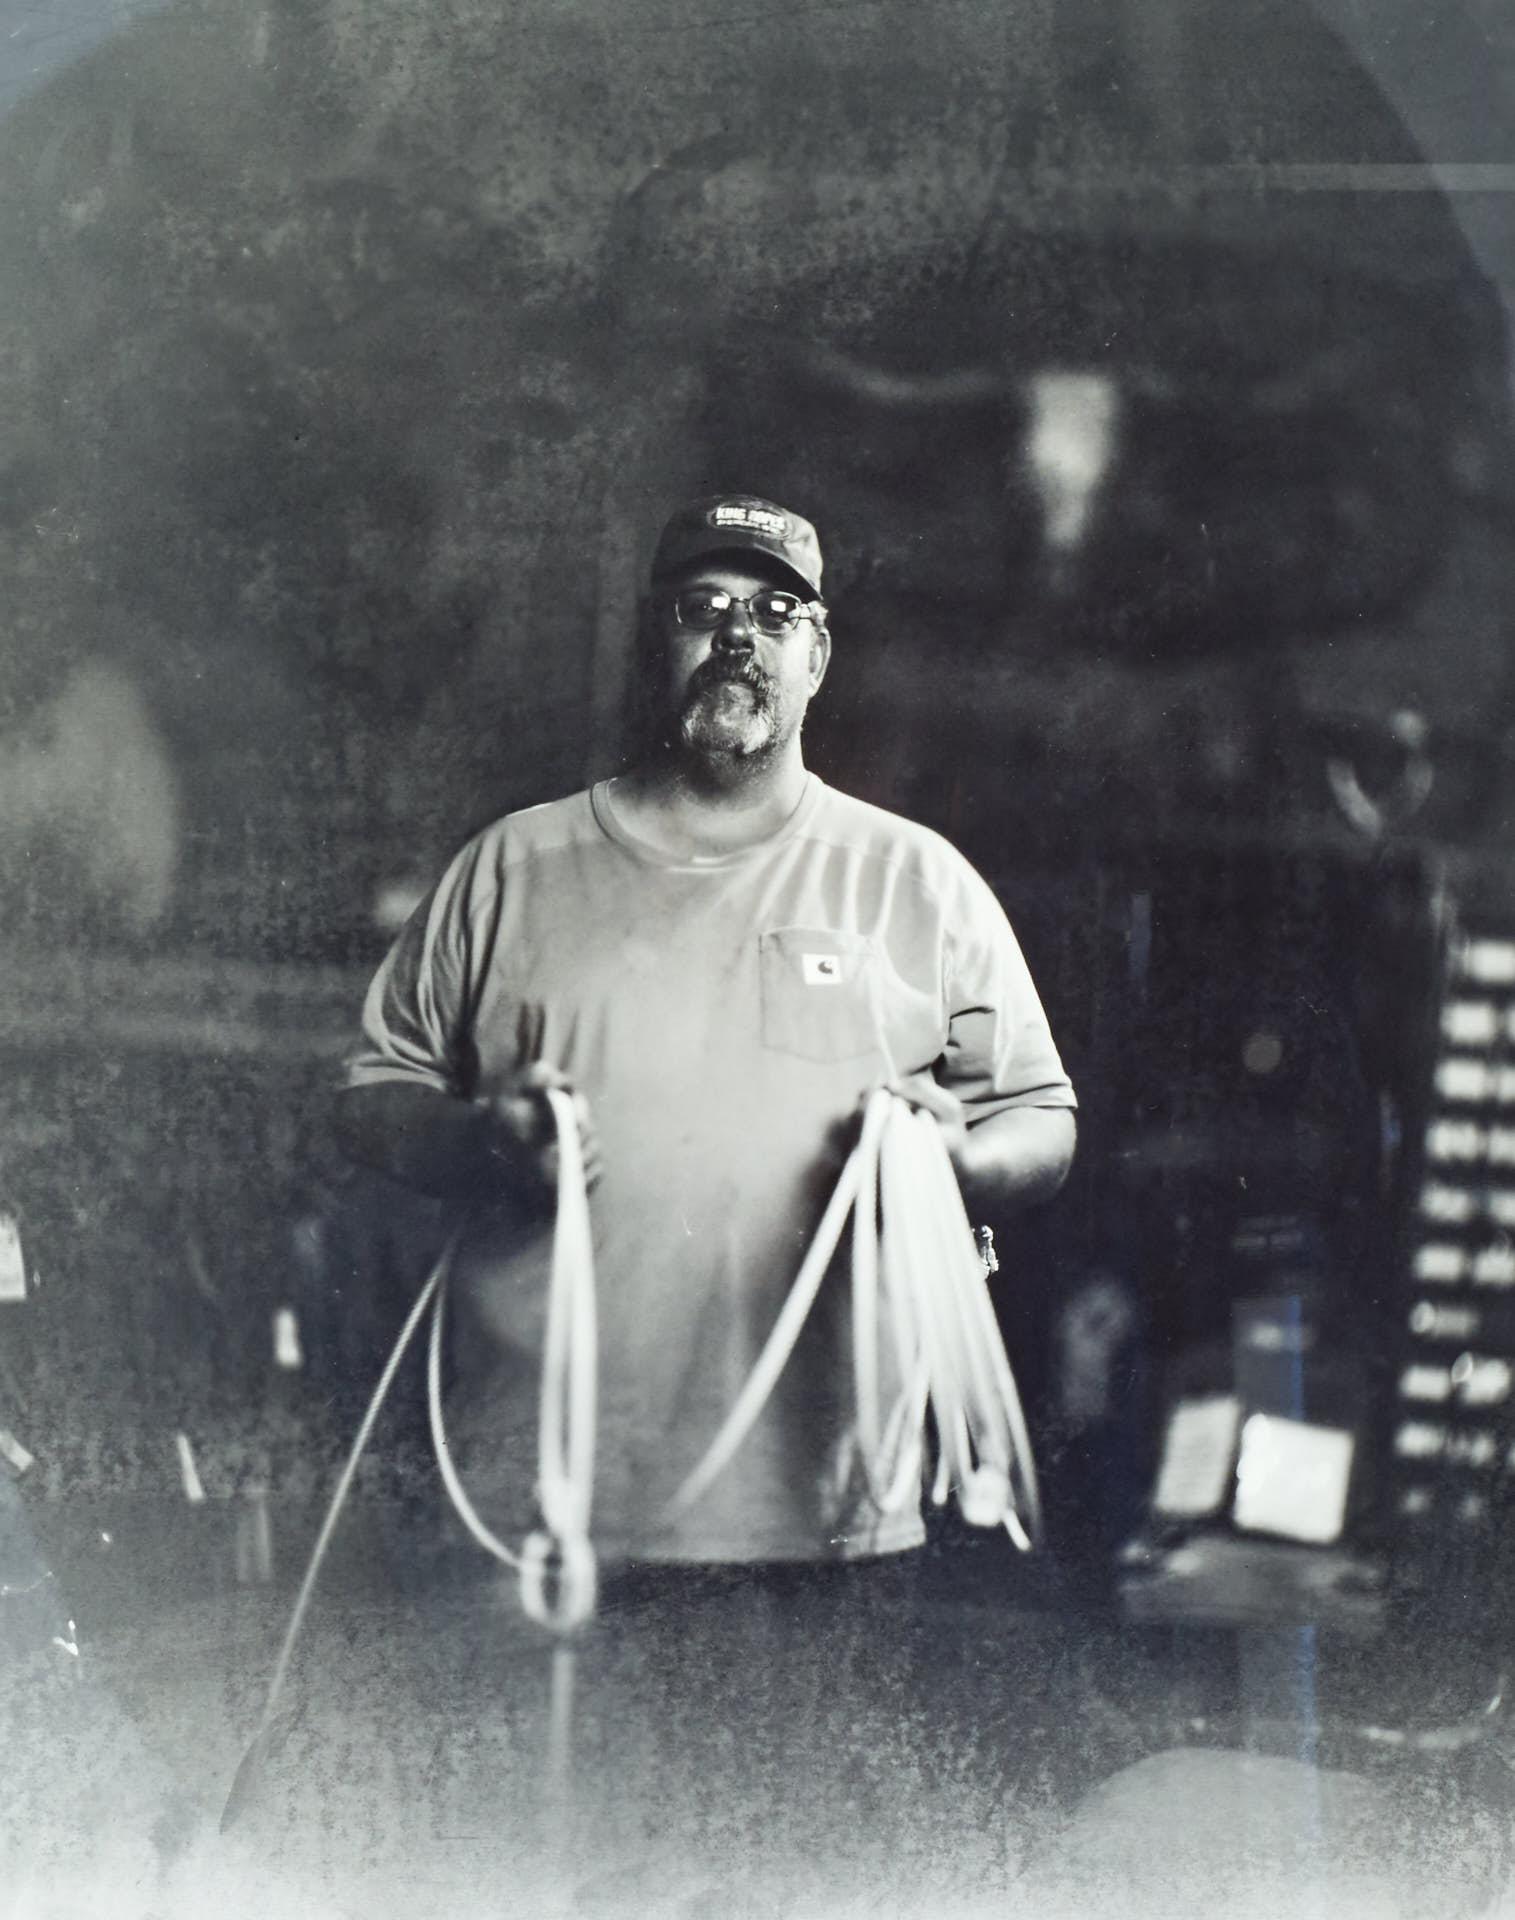 Roper maker Big Mike at King Ropes in Sheridan, Wyoming. Photo ©2015 Stephen Takacs Photography